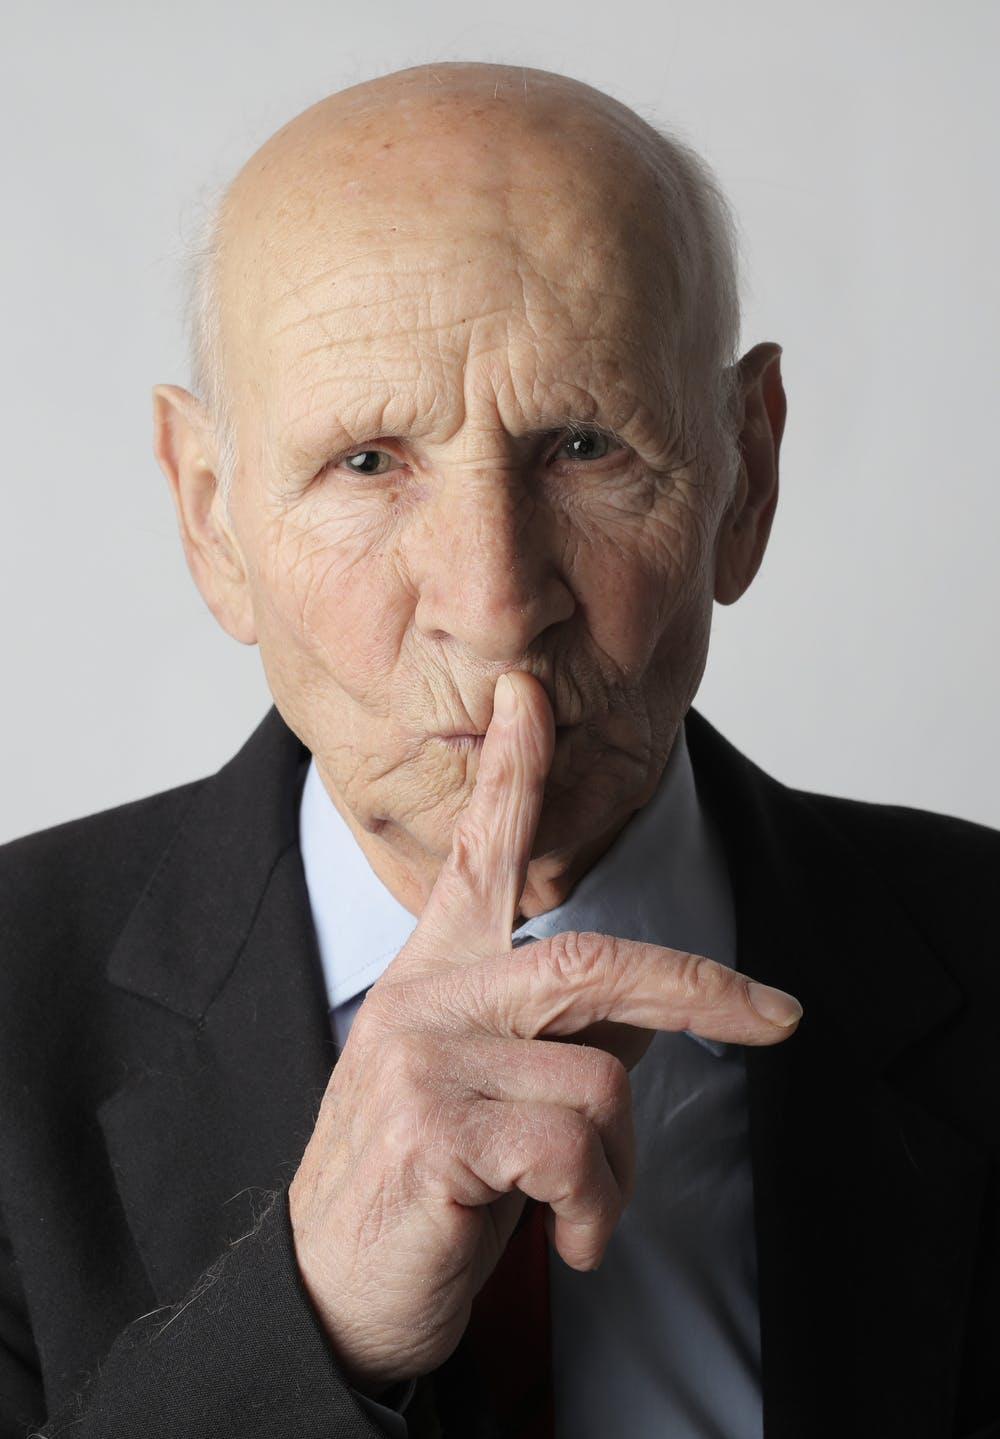 Old Man Gesturing Shh